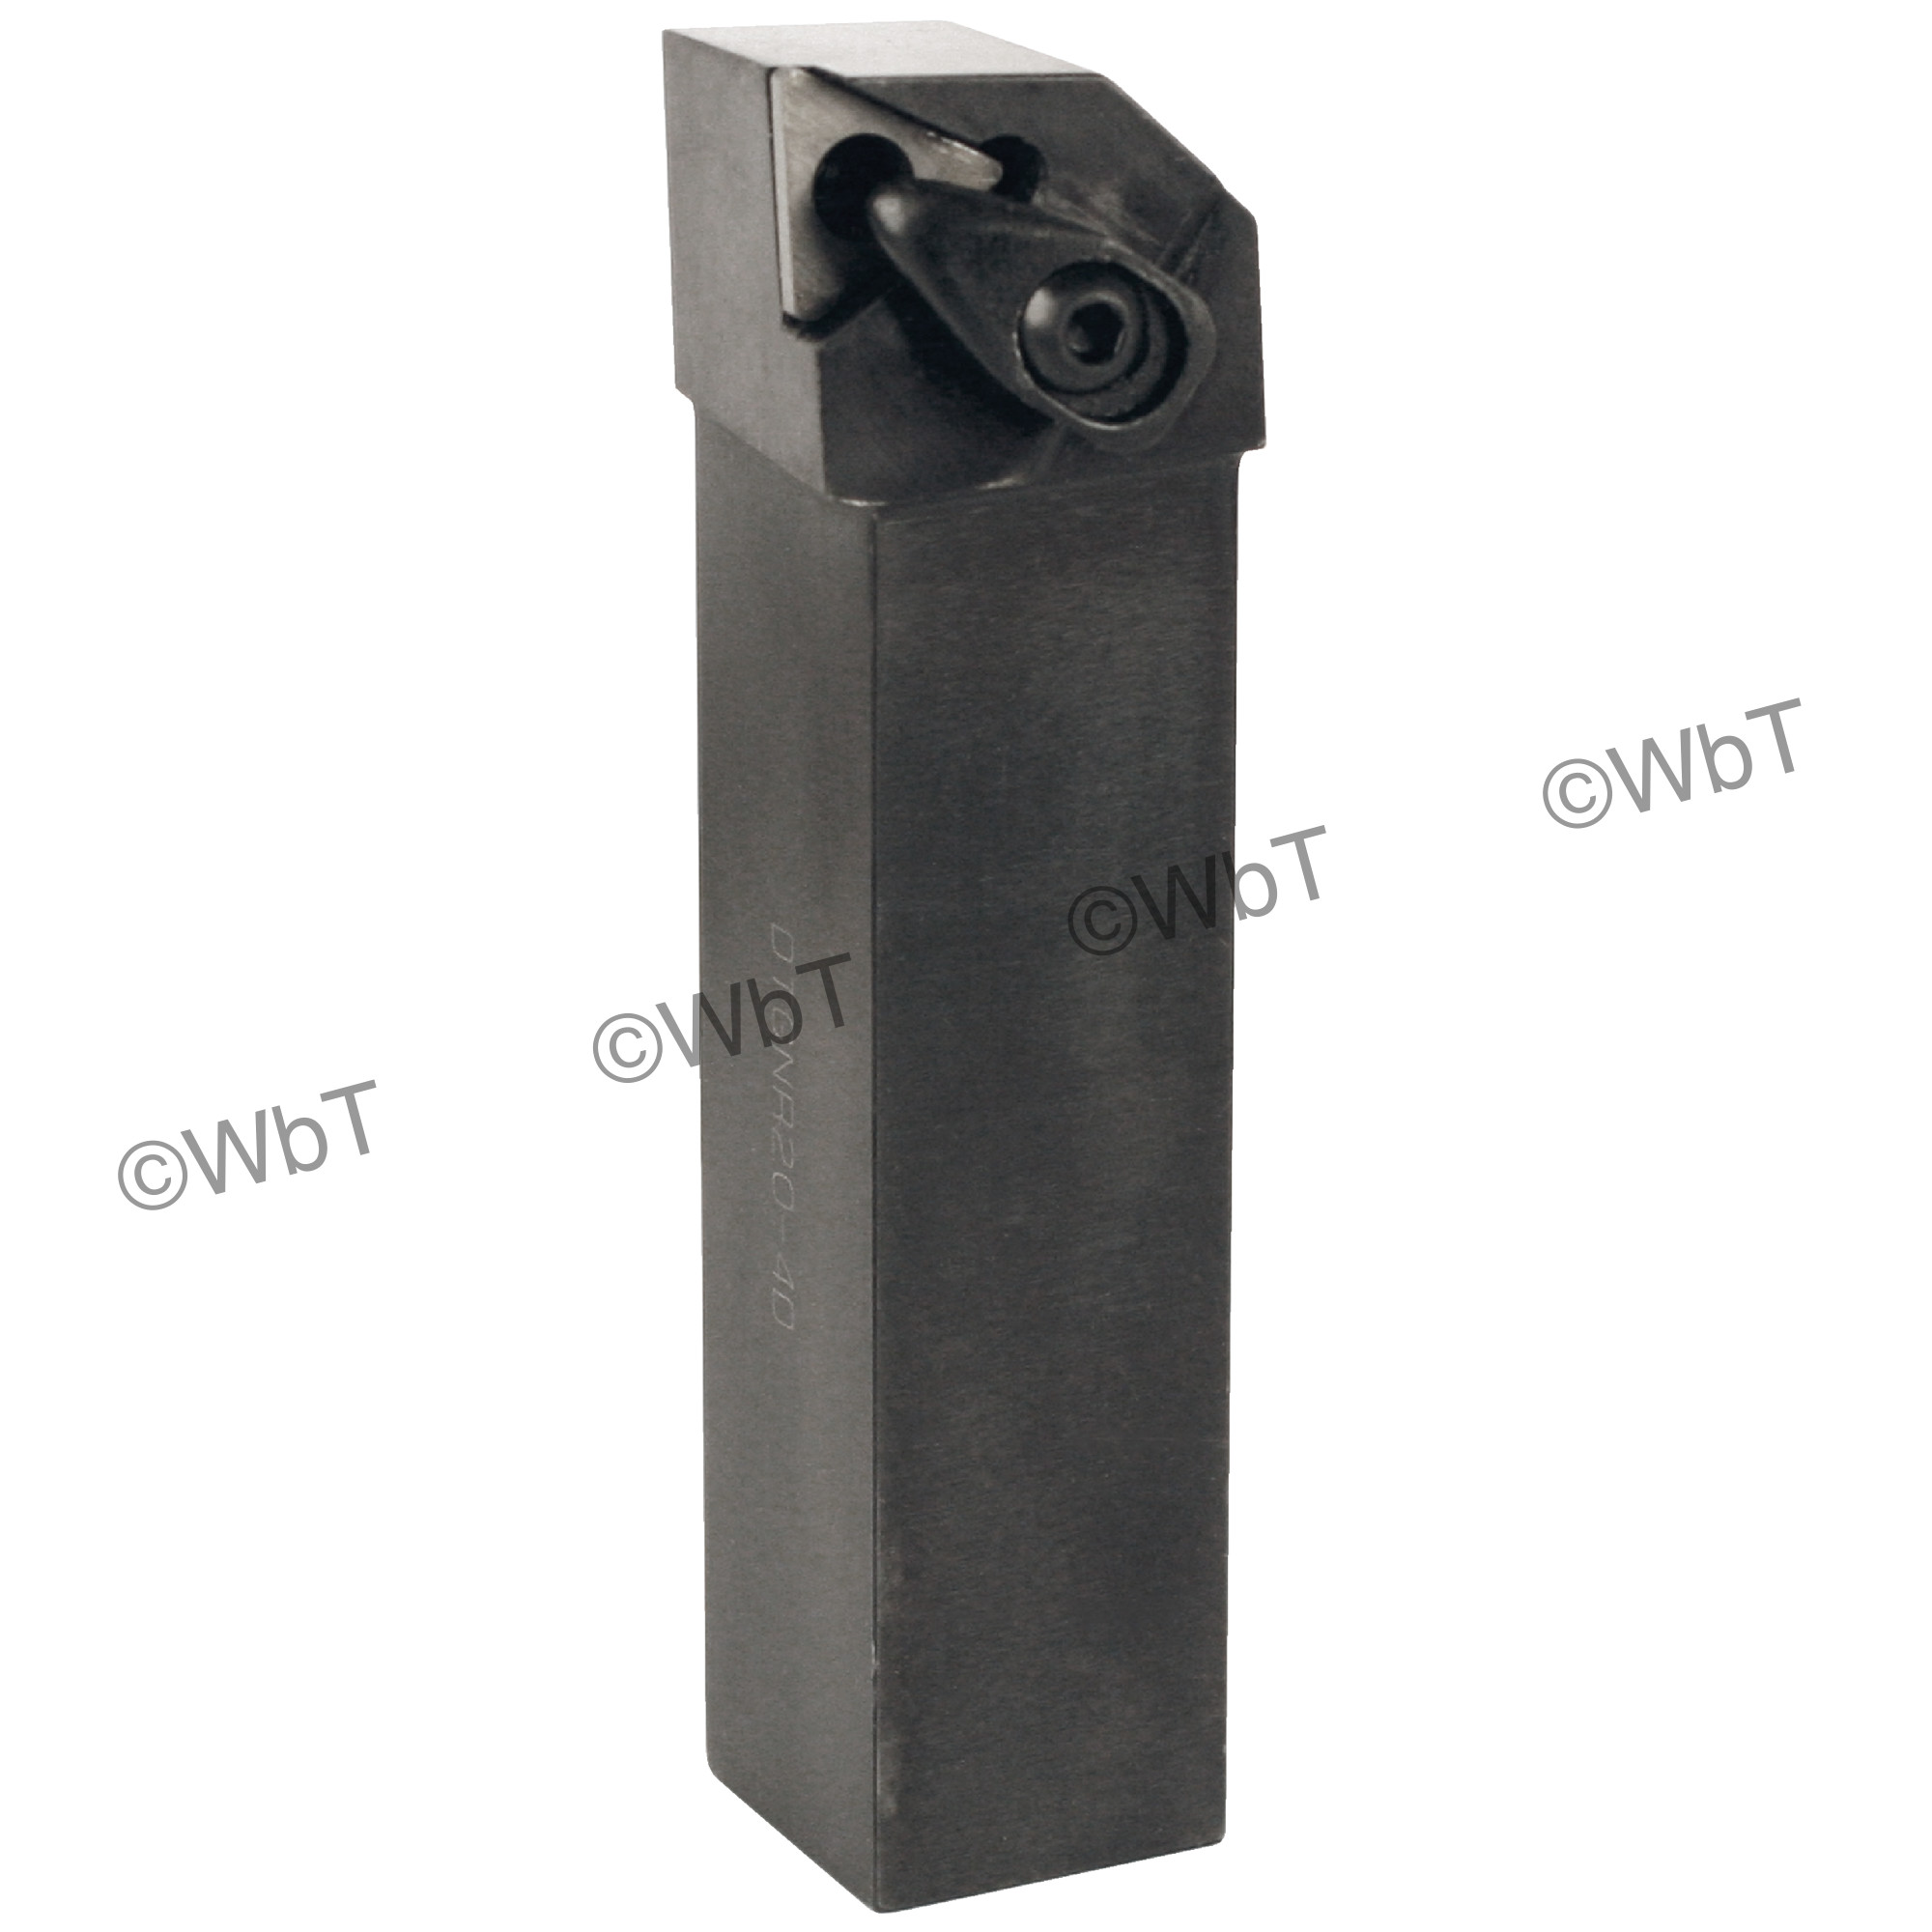 "TTC PRODUCTION - DTGNR20-4D / 1.250"" External Tool Holder for TNMG43_ Inserts / Right Hand"